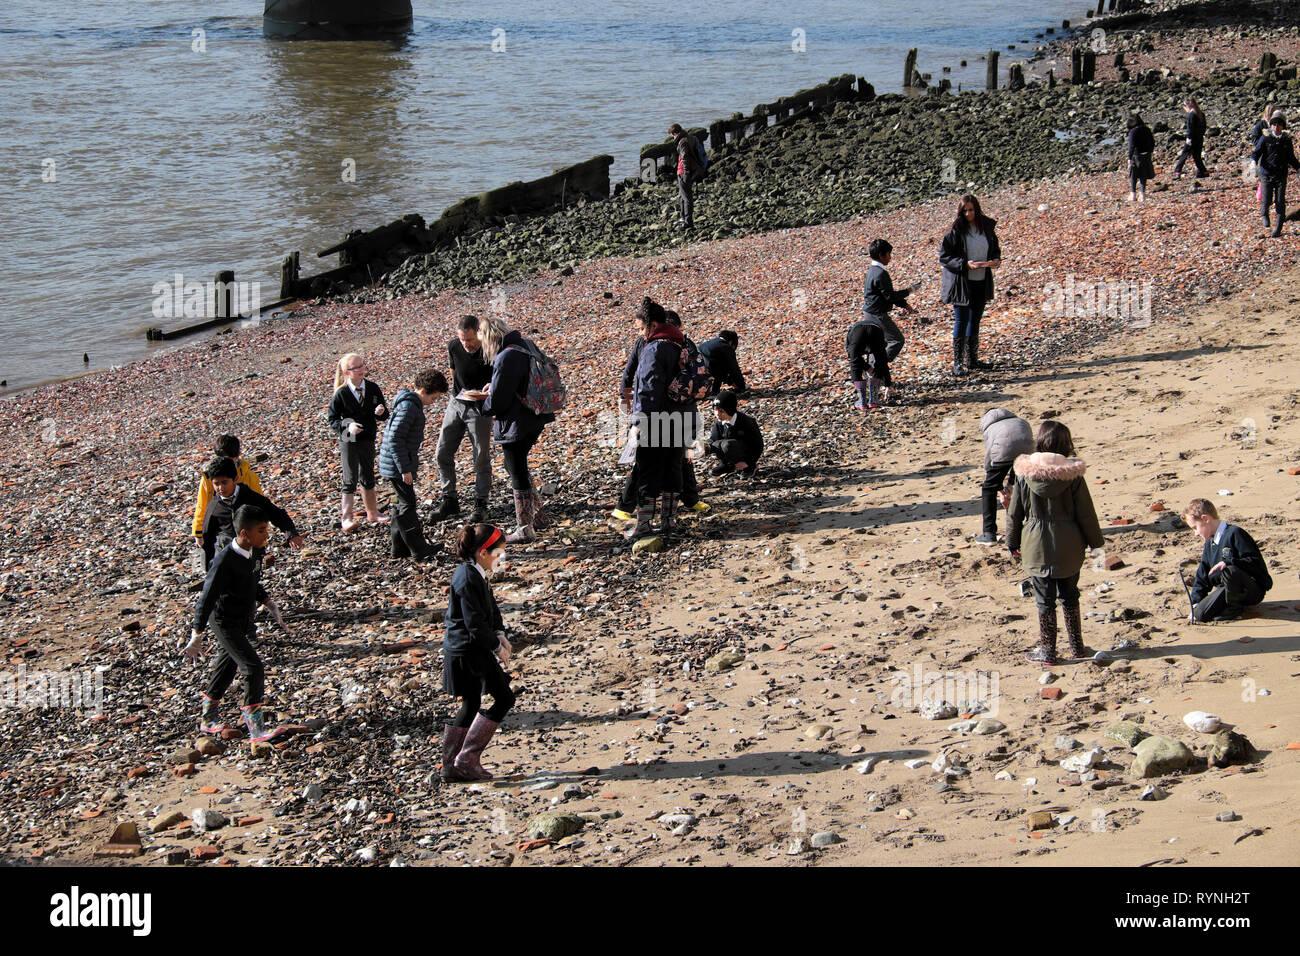 A view of schoolchildren school group mudlarking on the north sandy beach side of the River Thames in winter sunshine London England UK  KATHY DEWITT - Stock Image